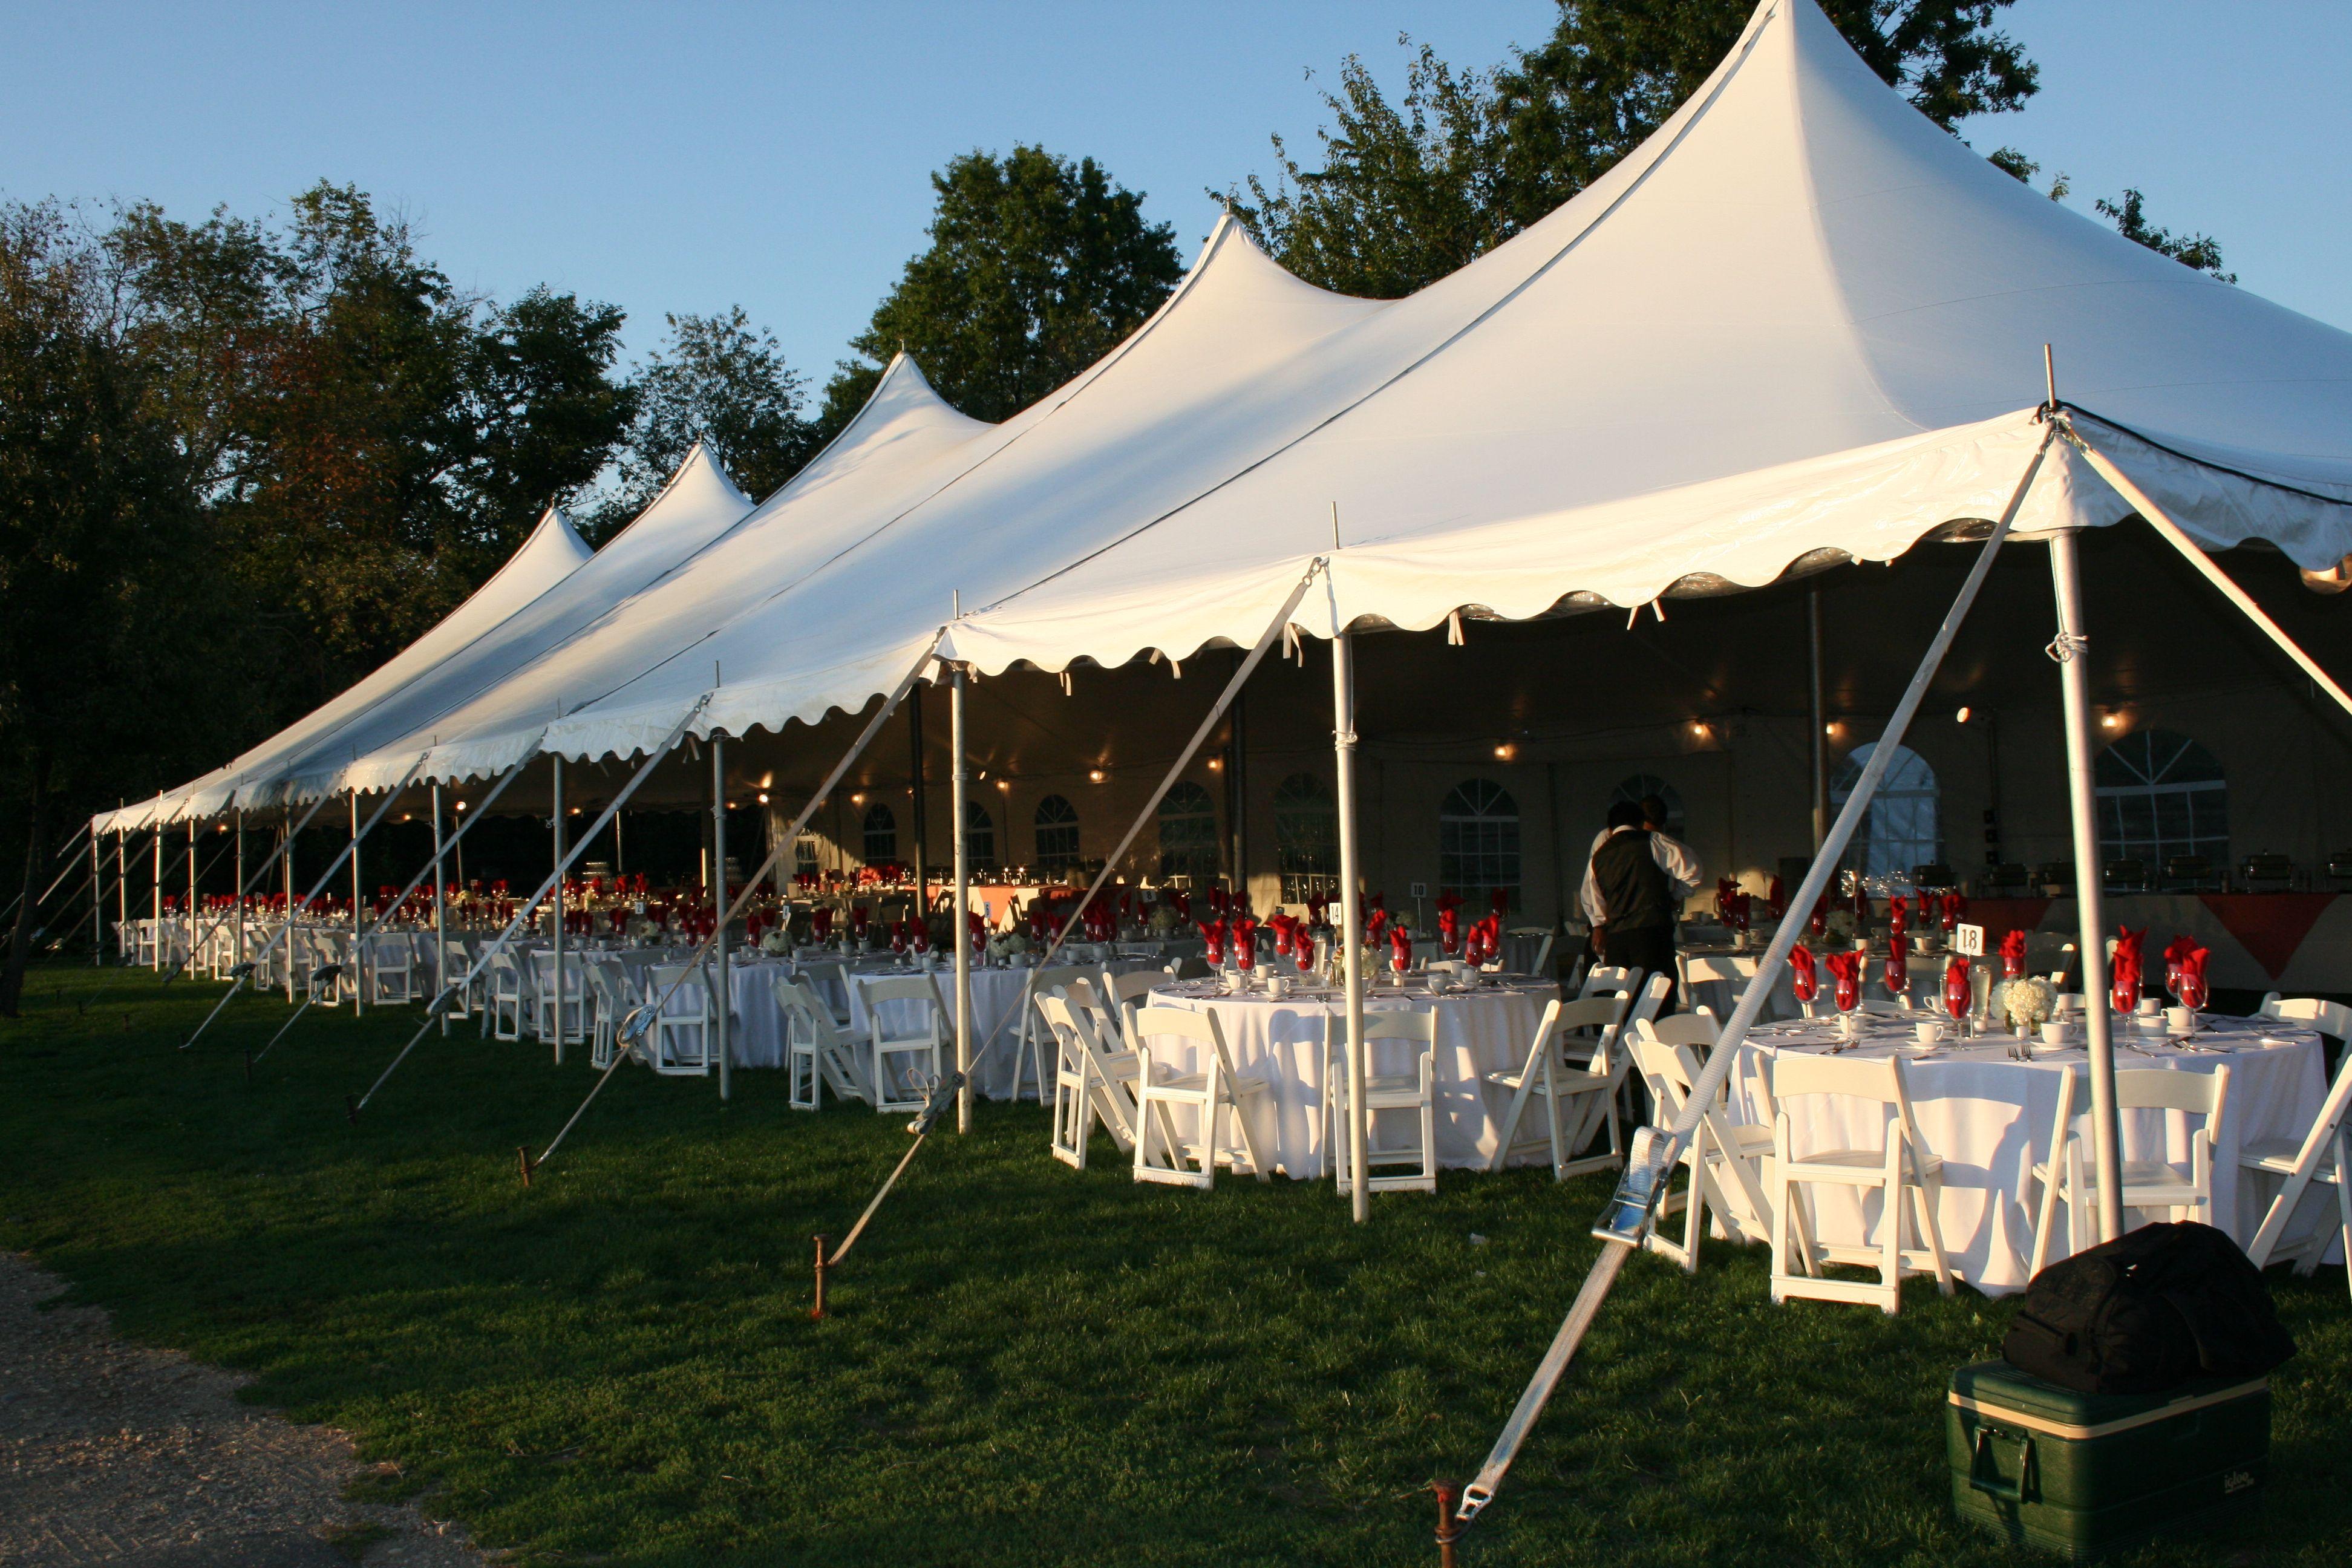 queens farm Tent Wedding & queens farm Tent Wedding | wedding inspiration | Pinterest | Tent ...